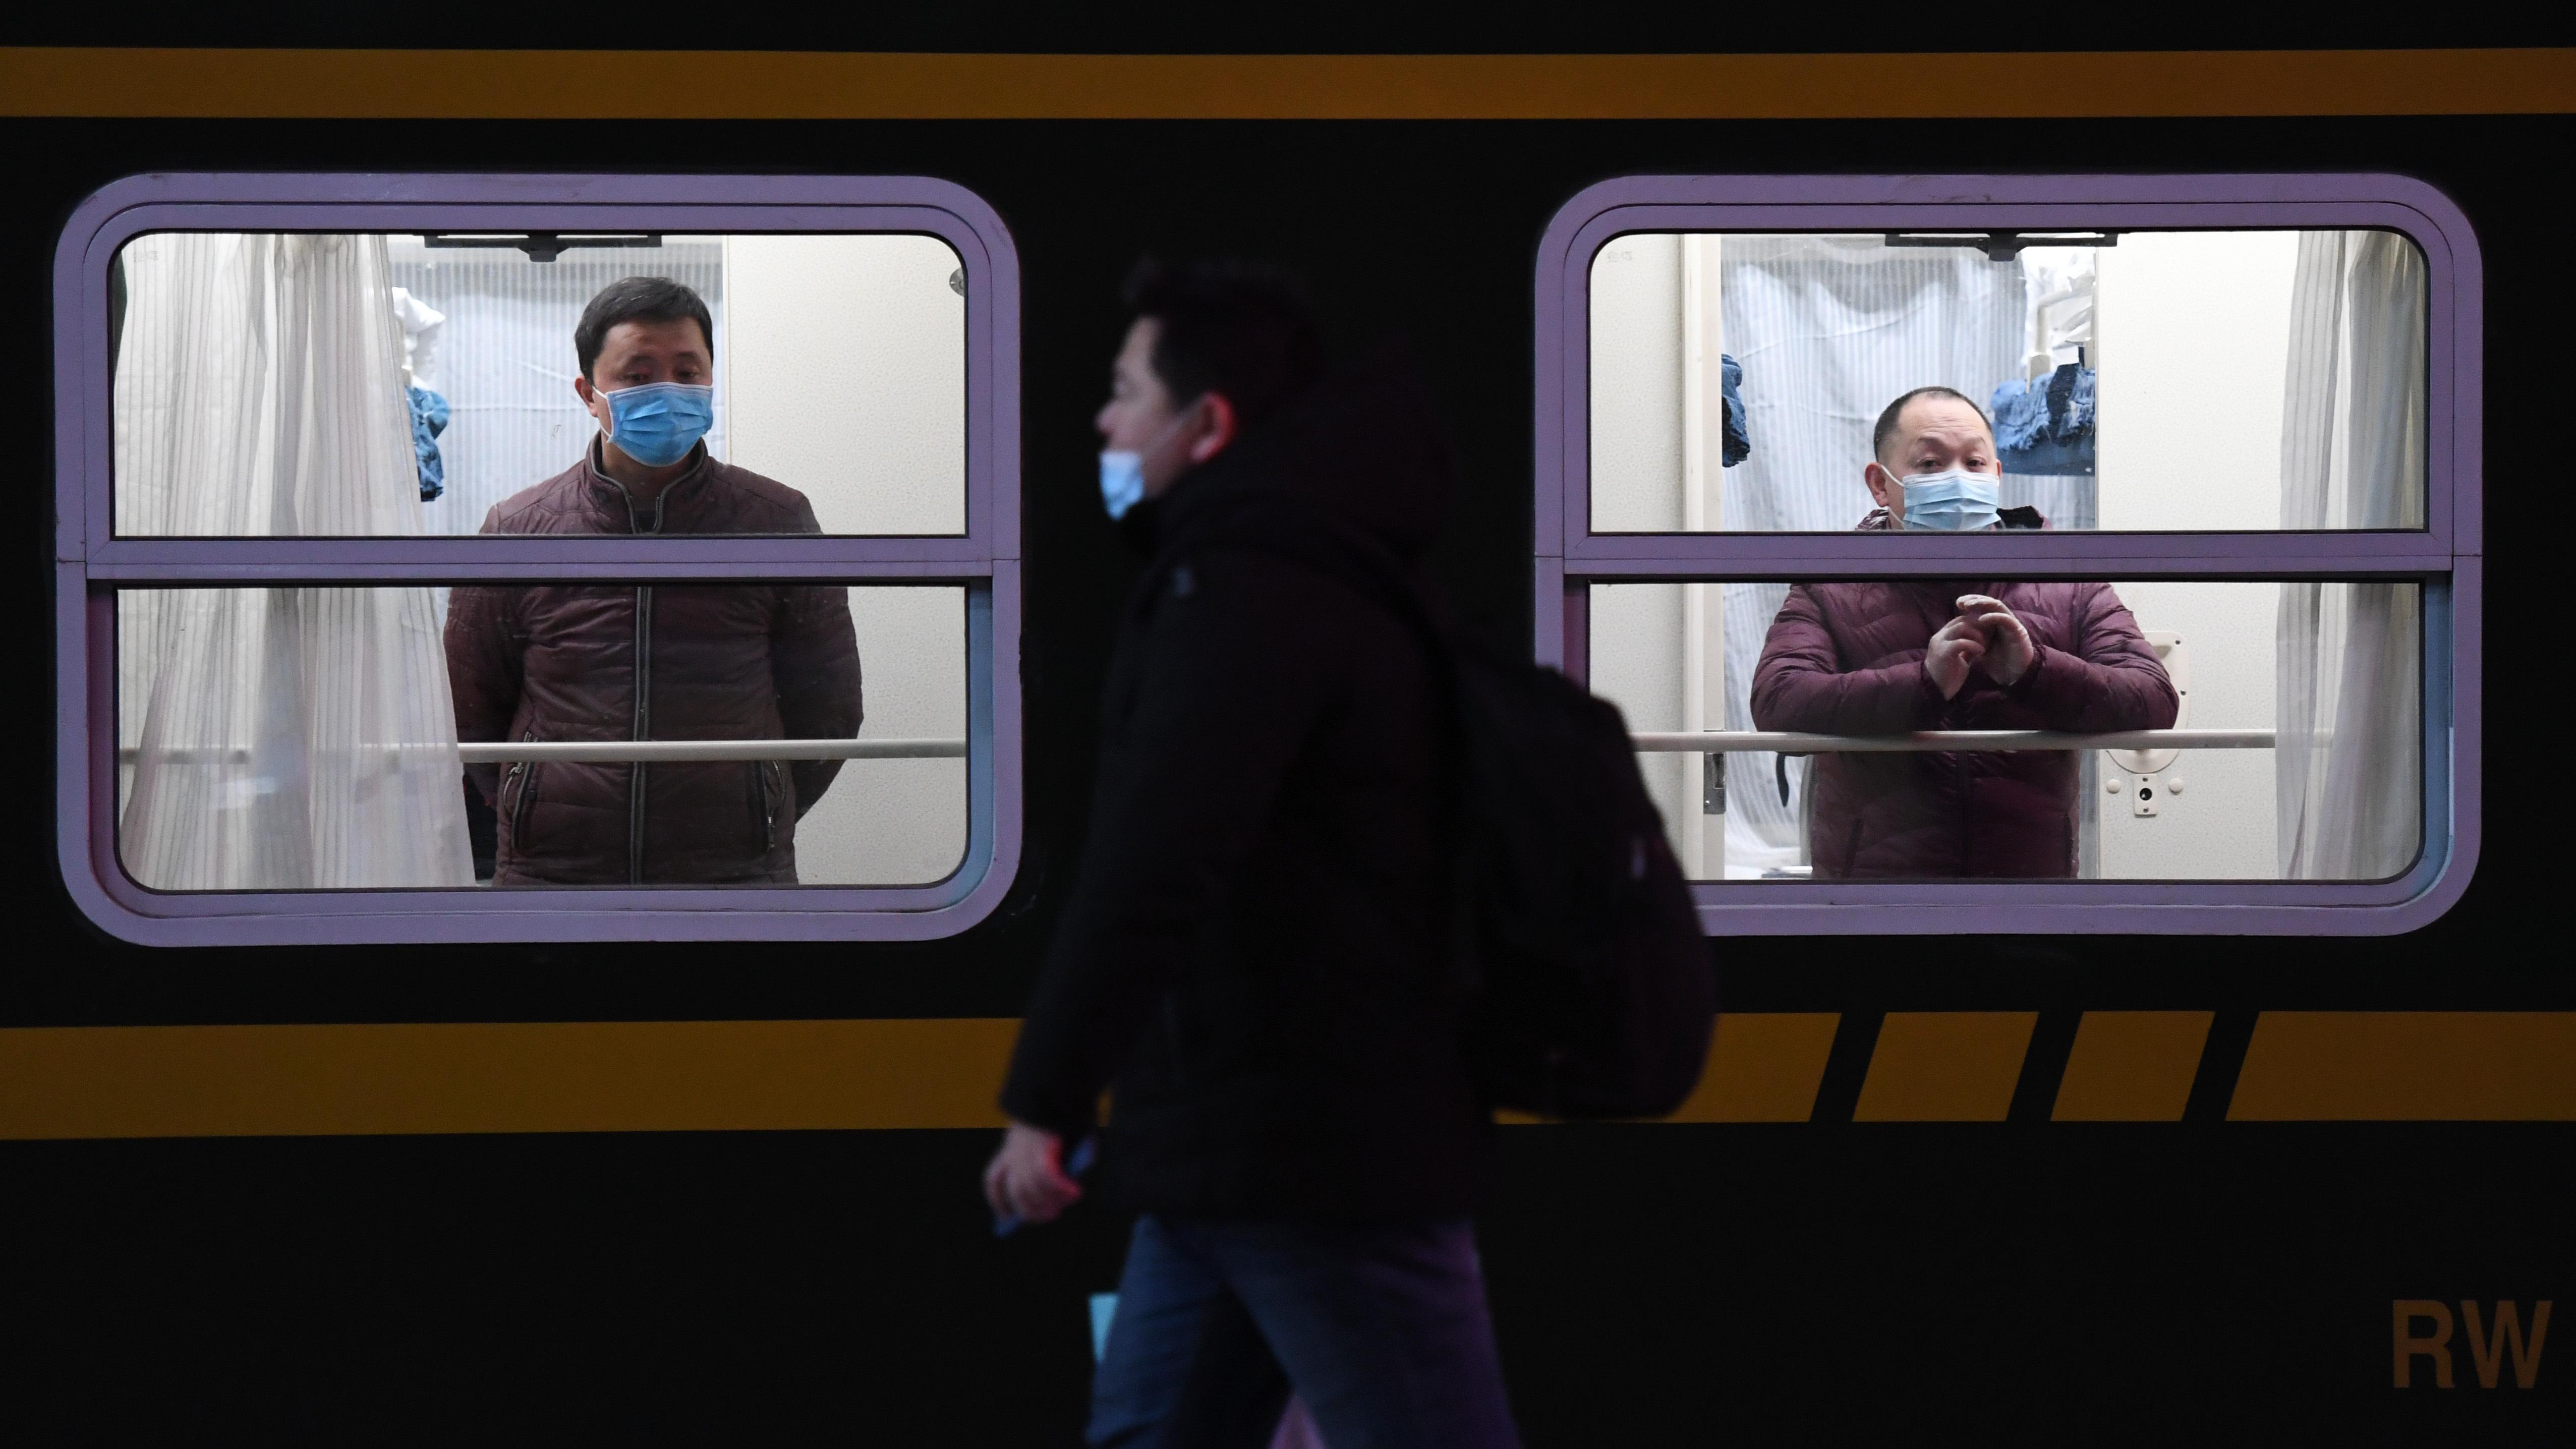 Beijing Railway Station sees start of holiday travel rush